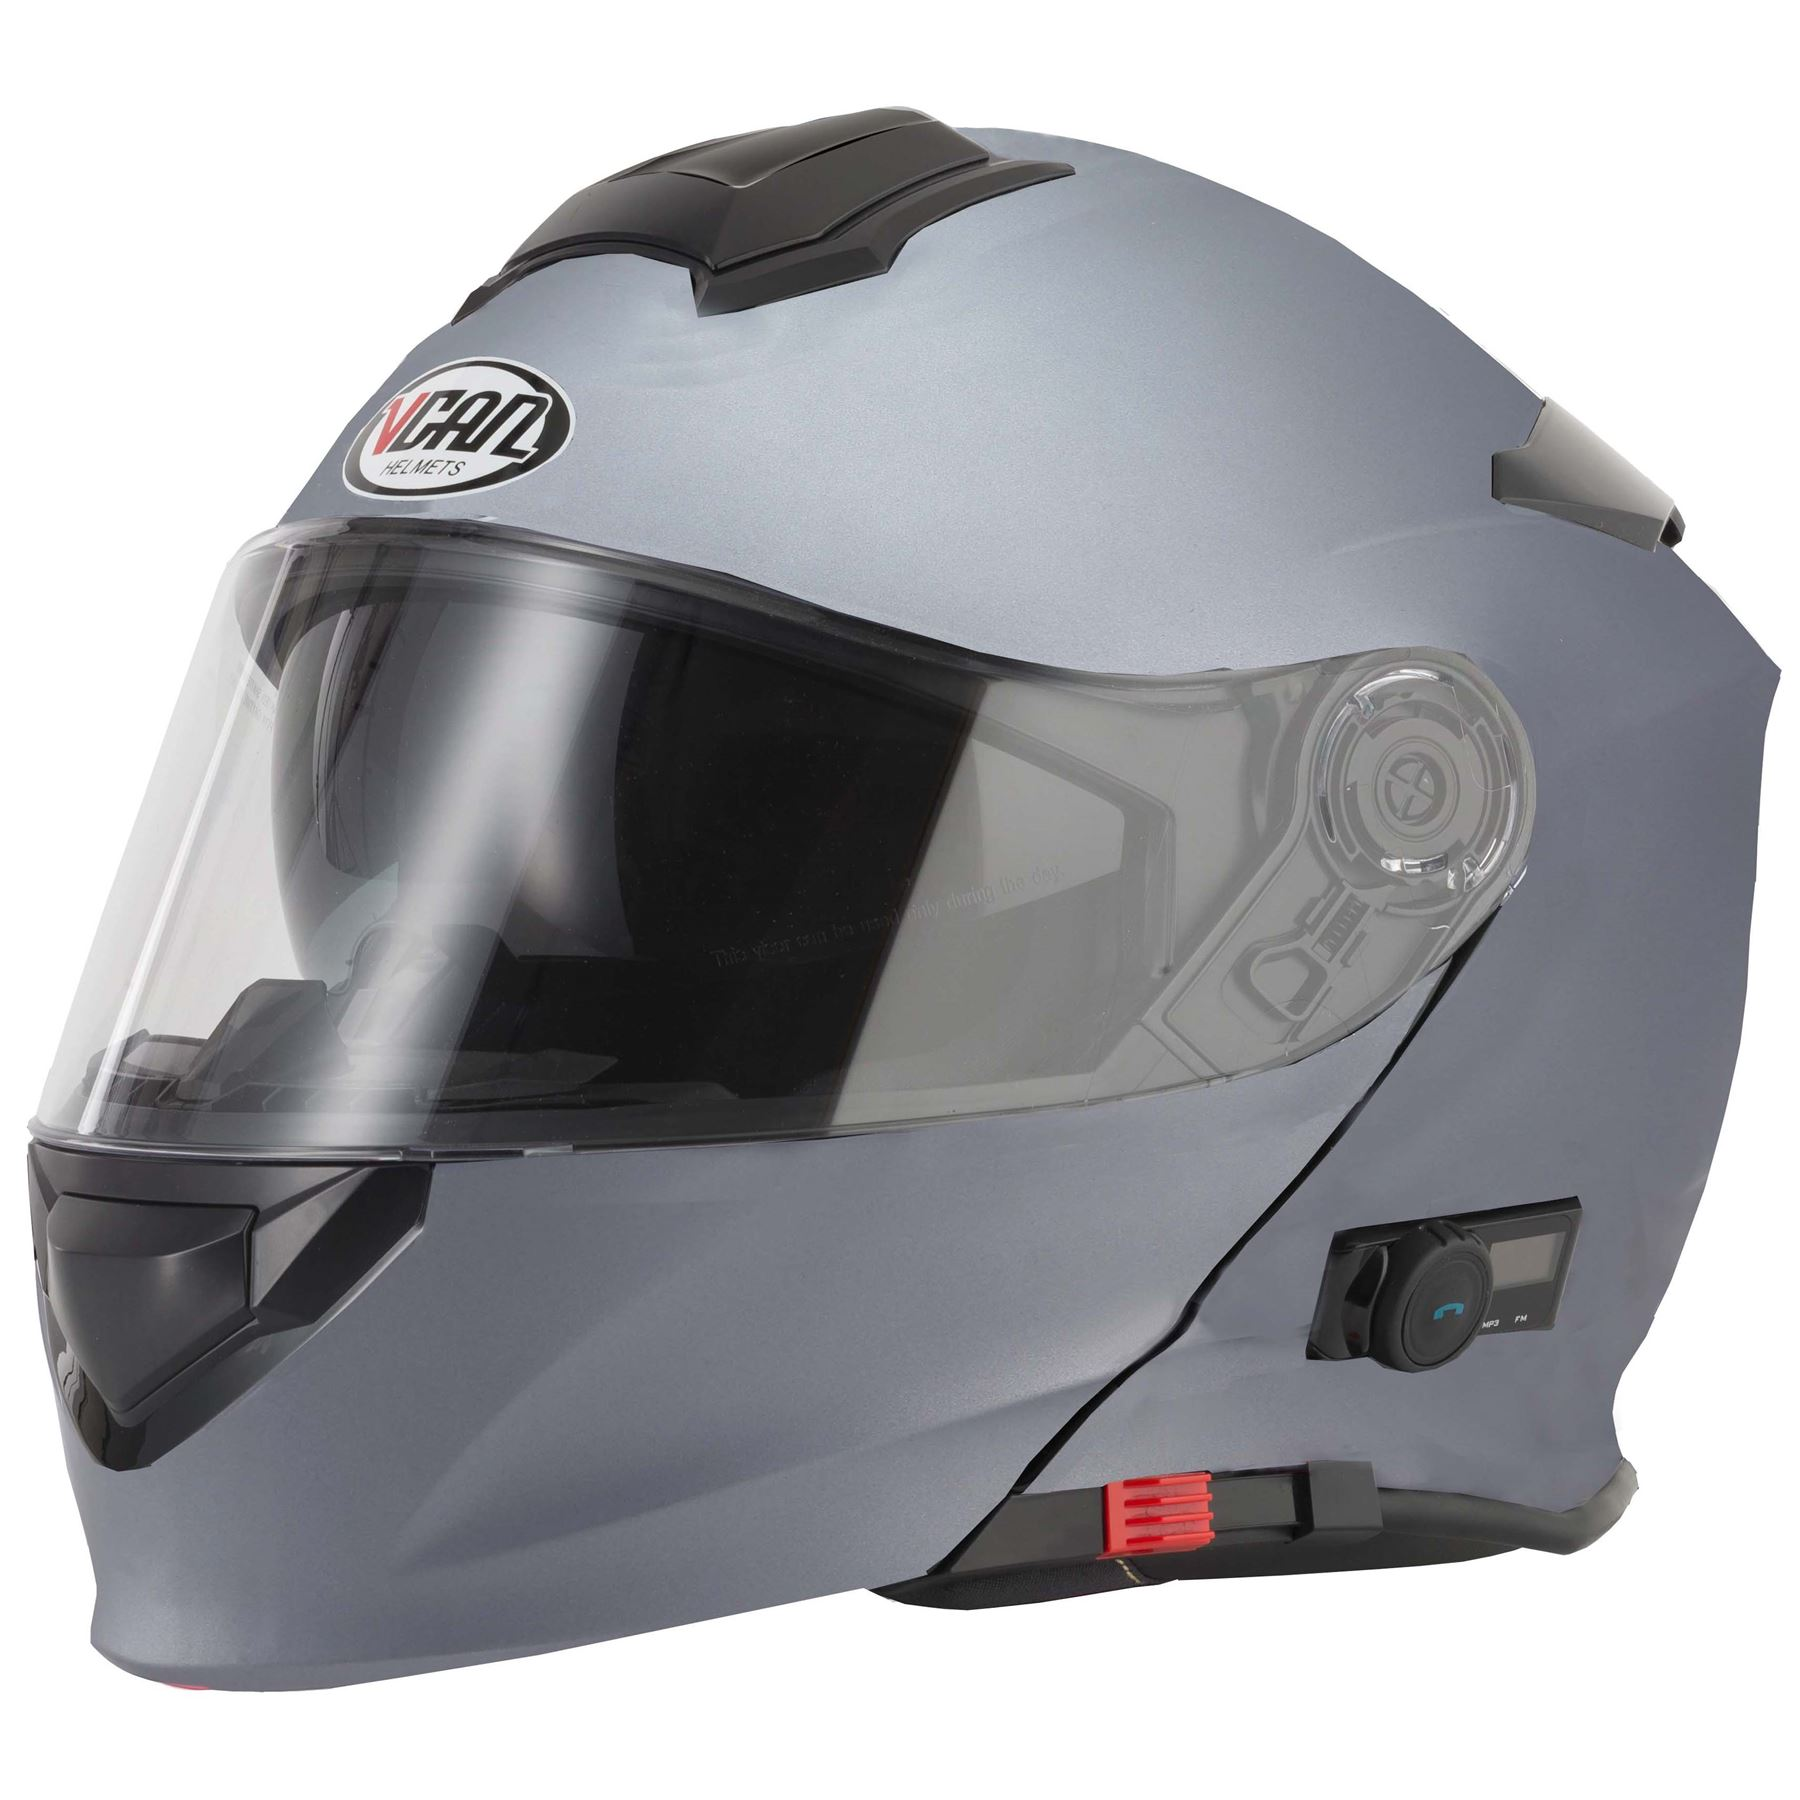 57-58cm VCAN V271 BLINC Flip Up Bluetooth Helmets Motorbike Motorcycle Bluetooth Touring Helmets Drogon M